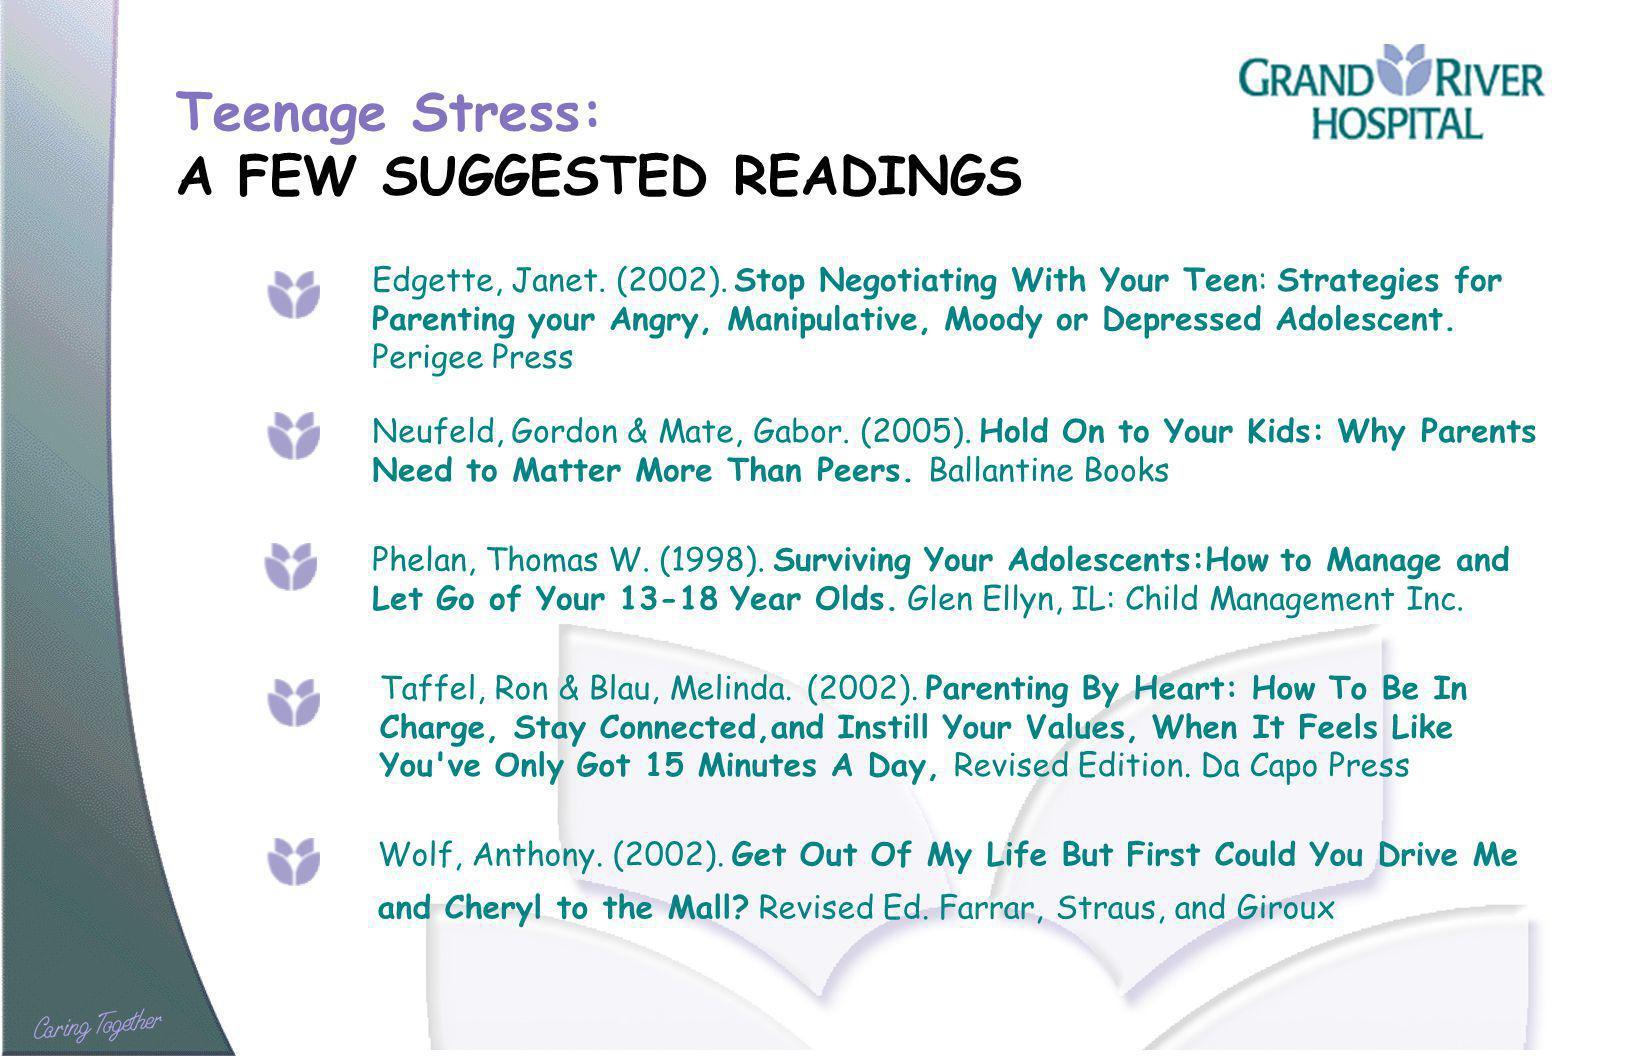 Teenage Stress: A FEW SUGGESTED READINGS Phelan, Thomas W.